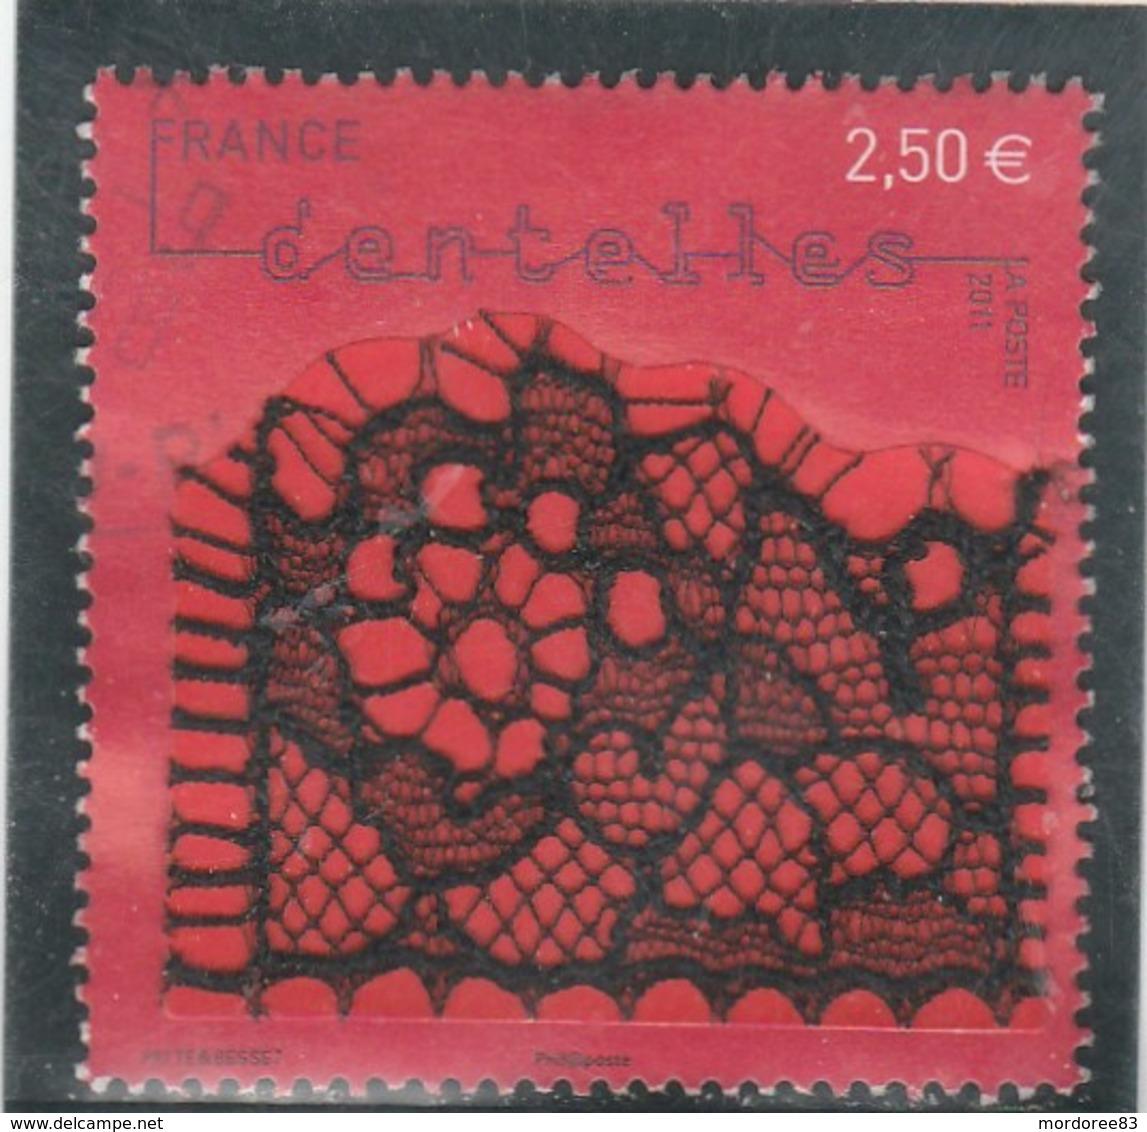 FRANCE 2011 DENTELLE MECANIQUE TYPE CHANTILLY OBLITERE YT 4602 - - France